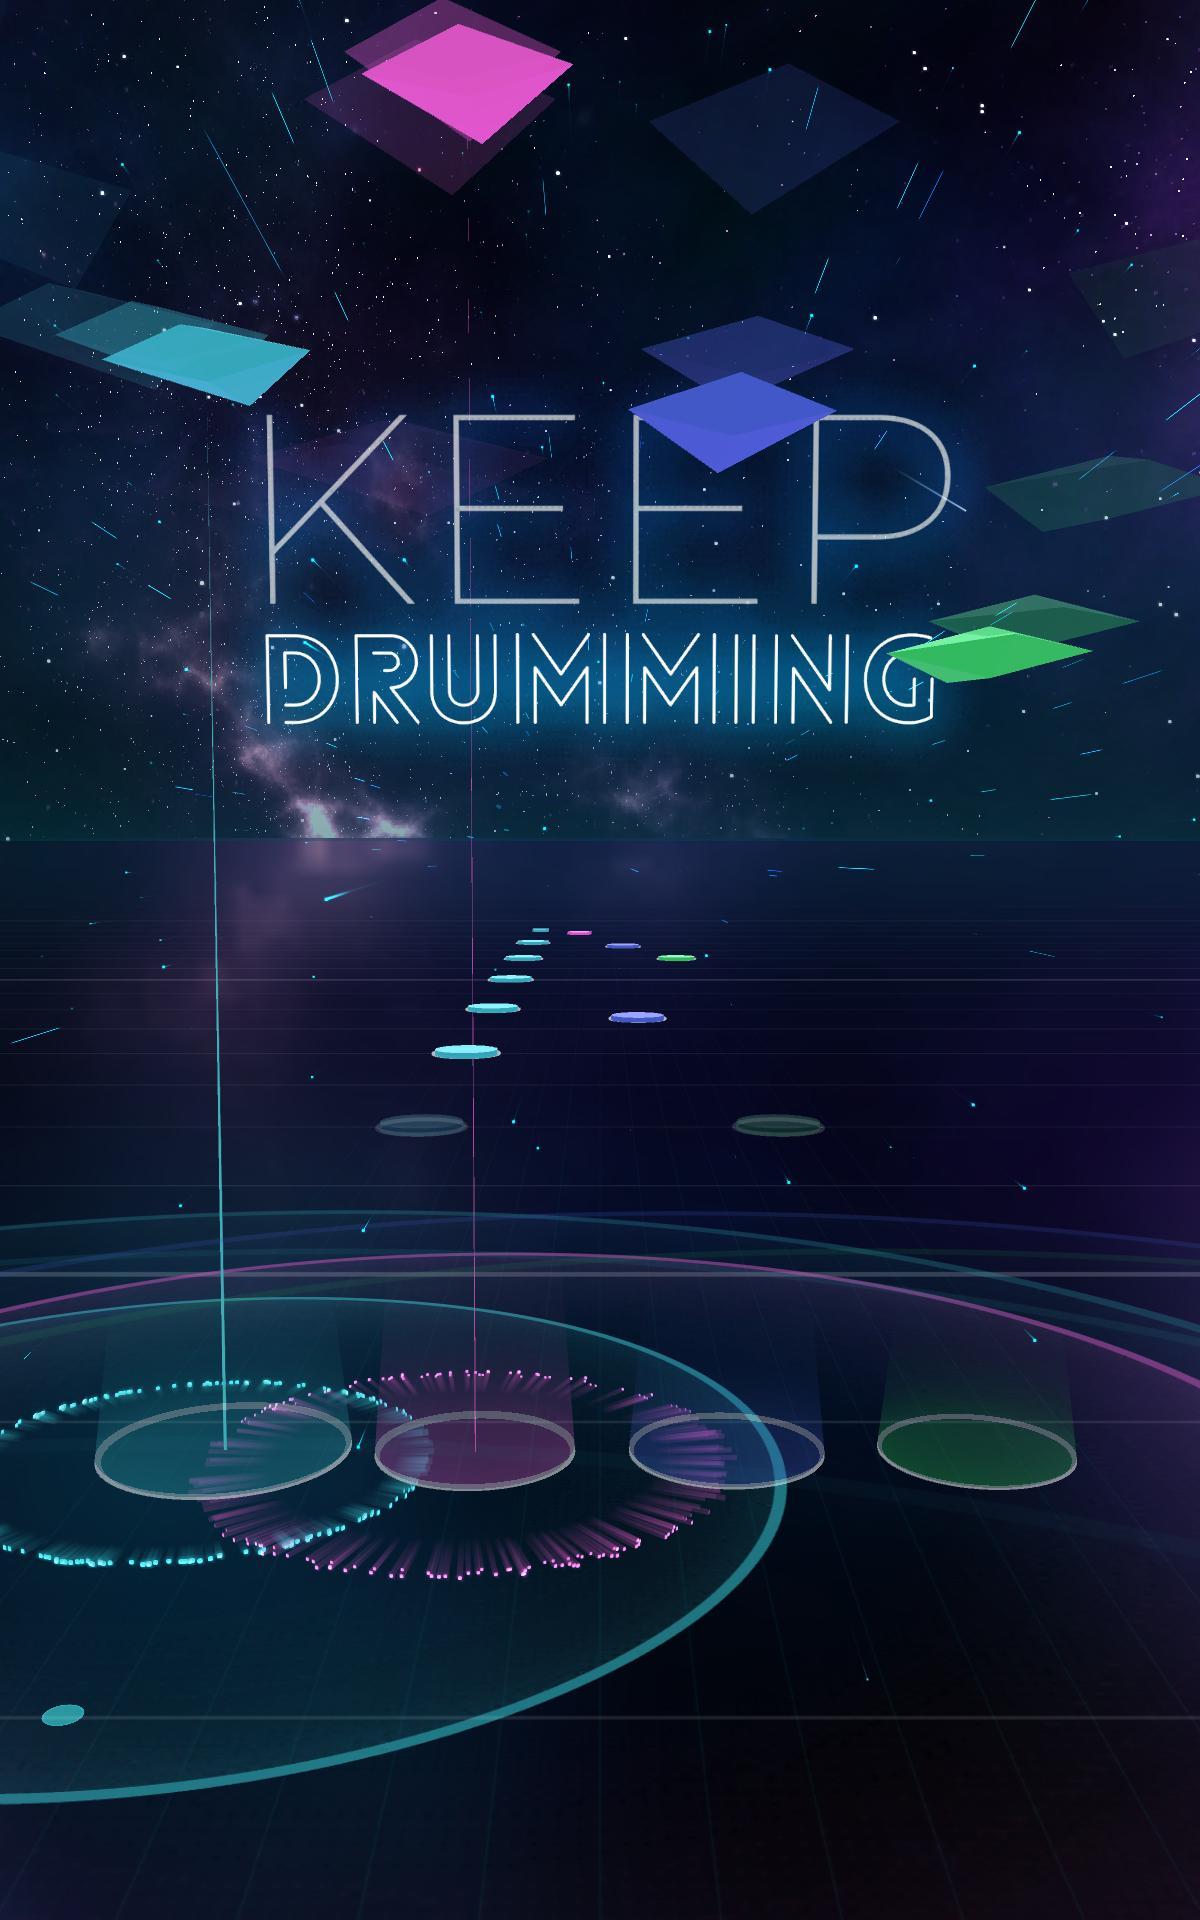 Sound Sky — Keep Calm, Drum On 1.7.3 Screenshot 12